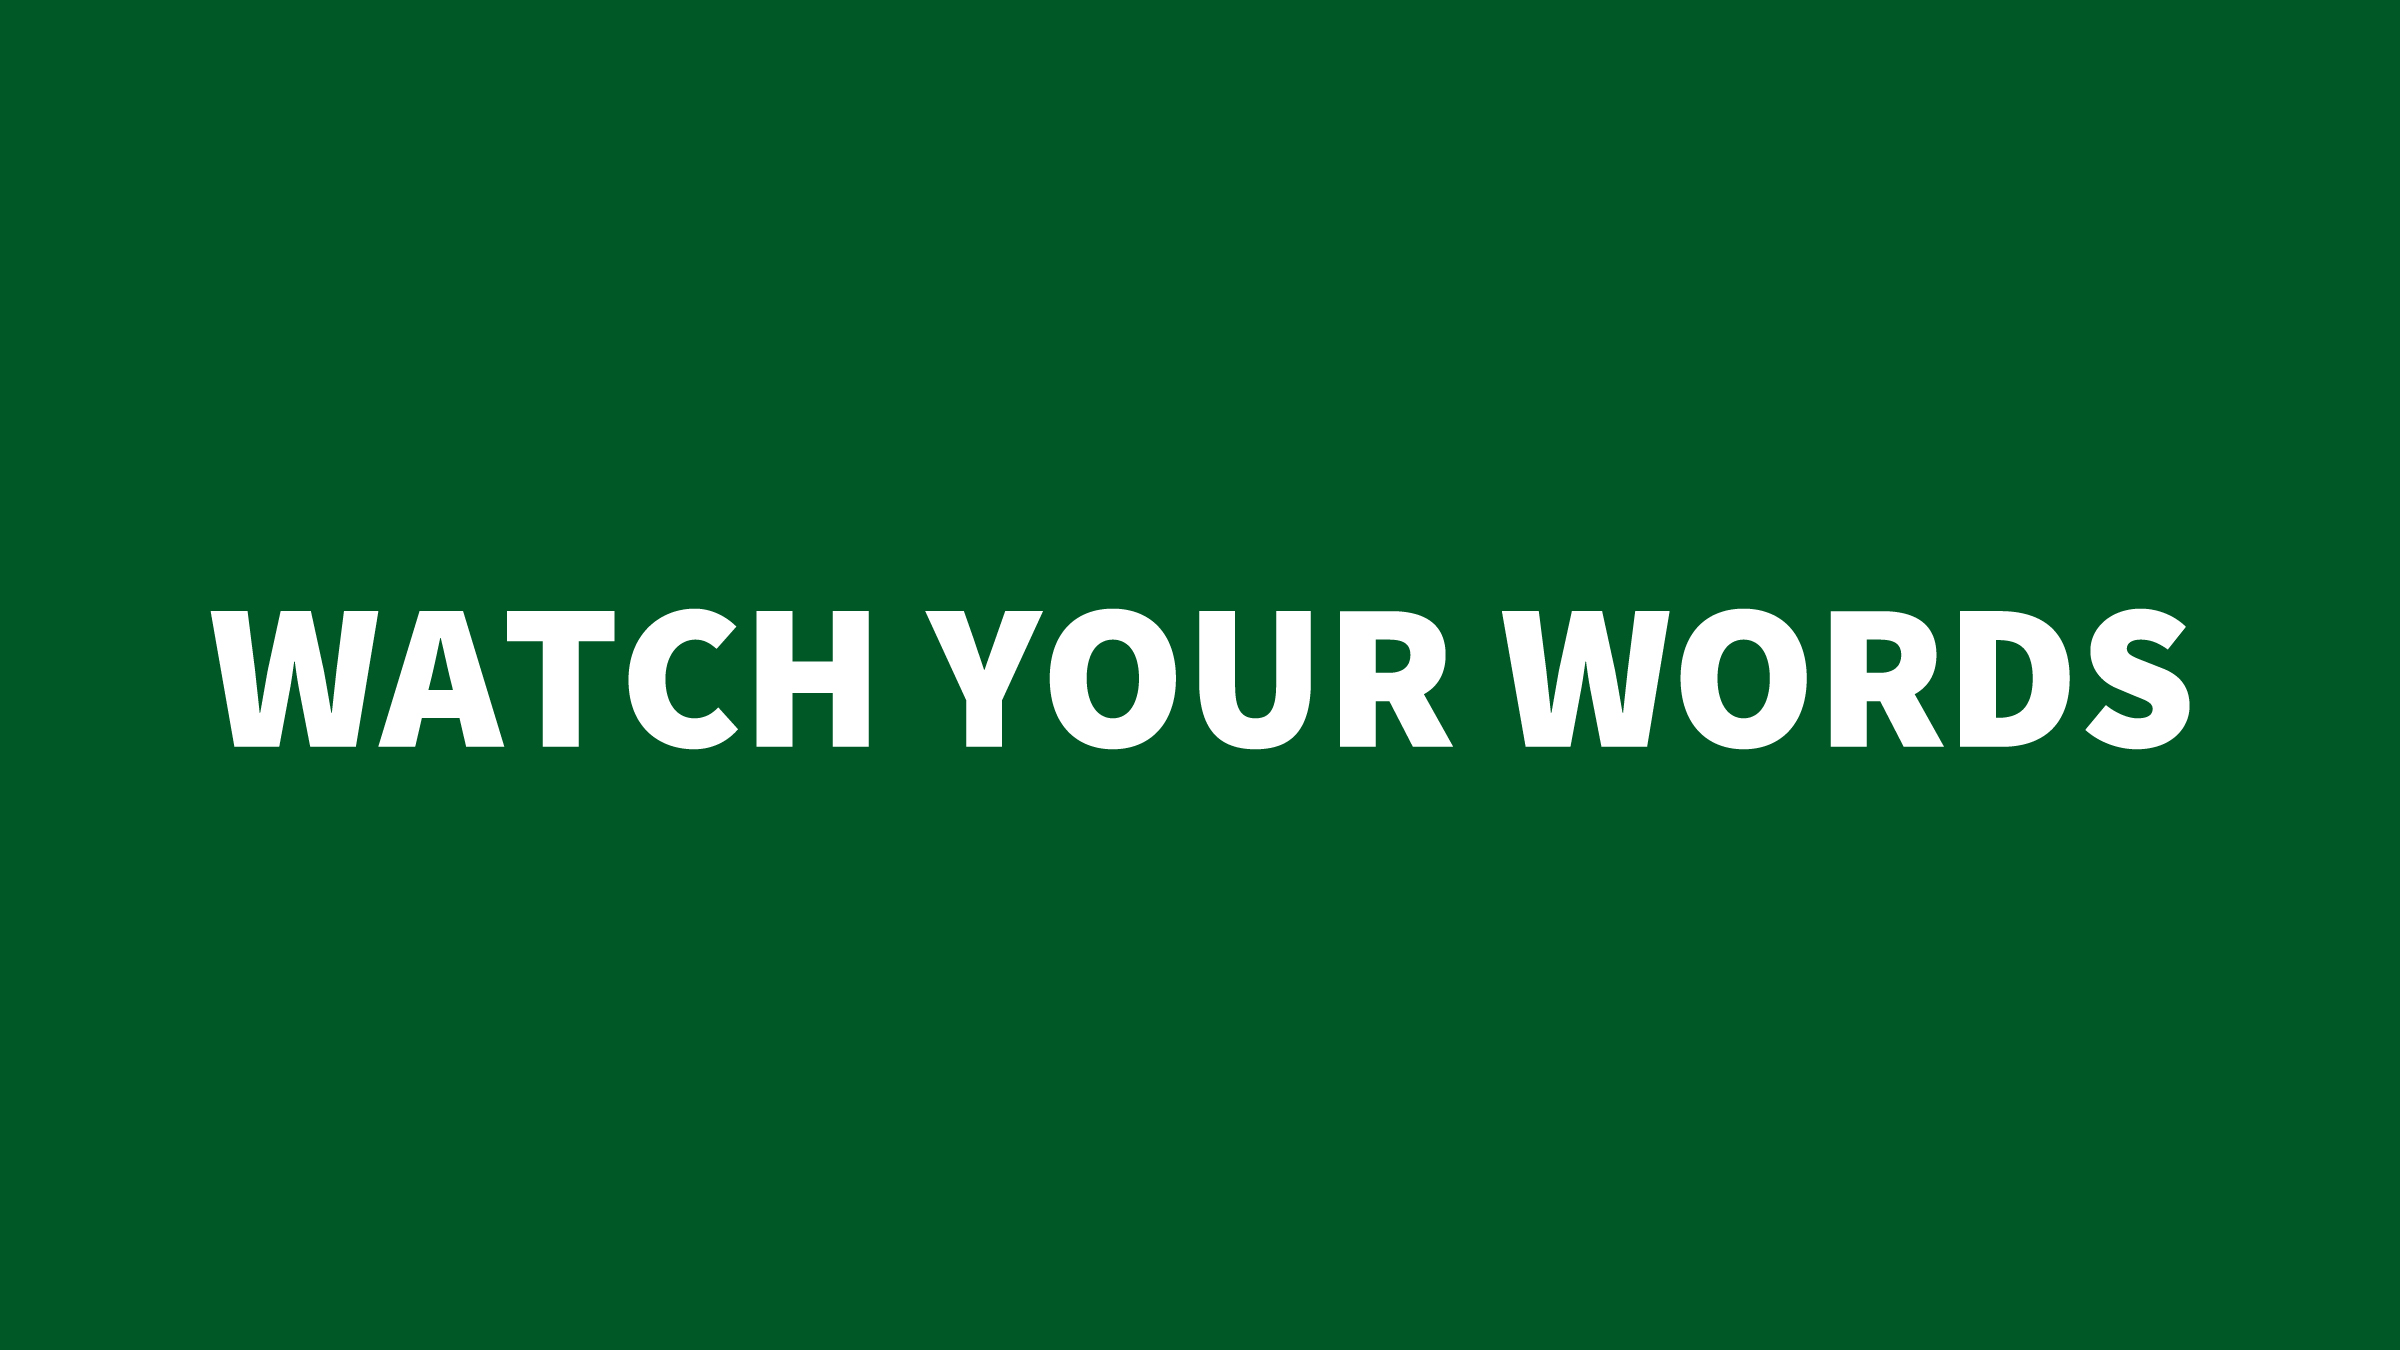 James 3 - Watch your words (green).jpg